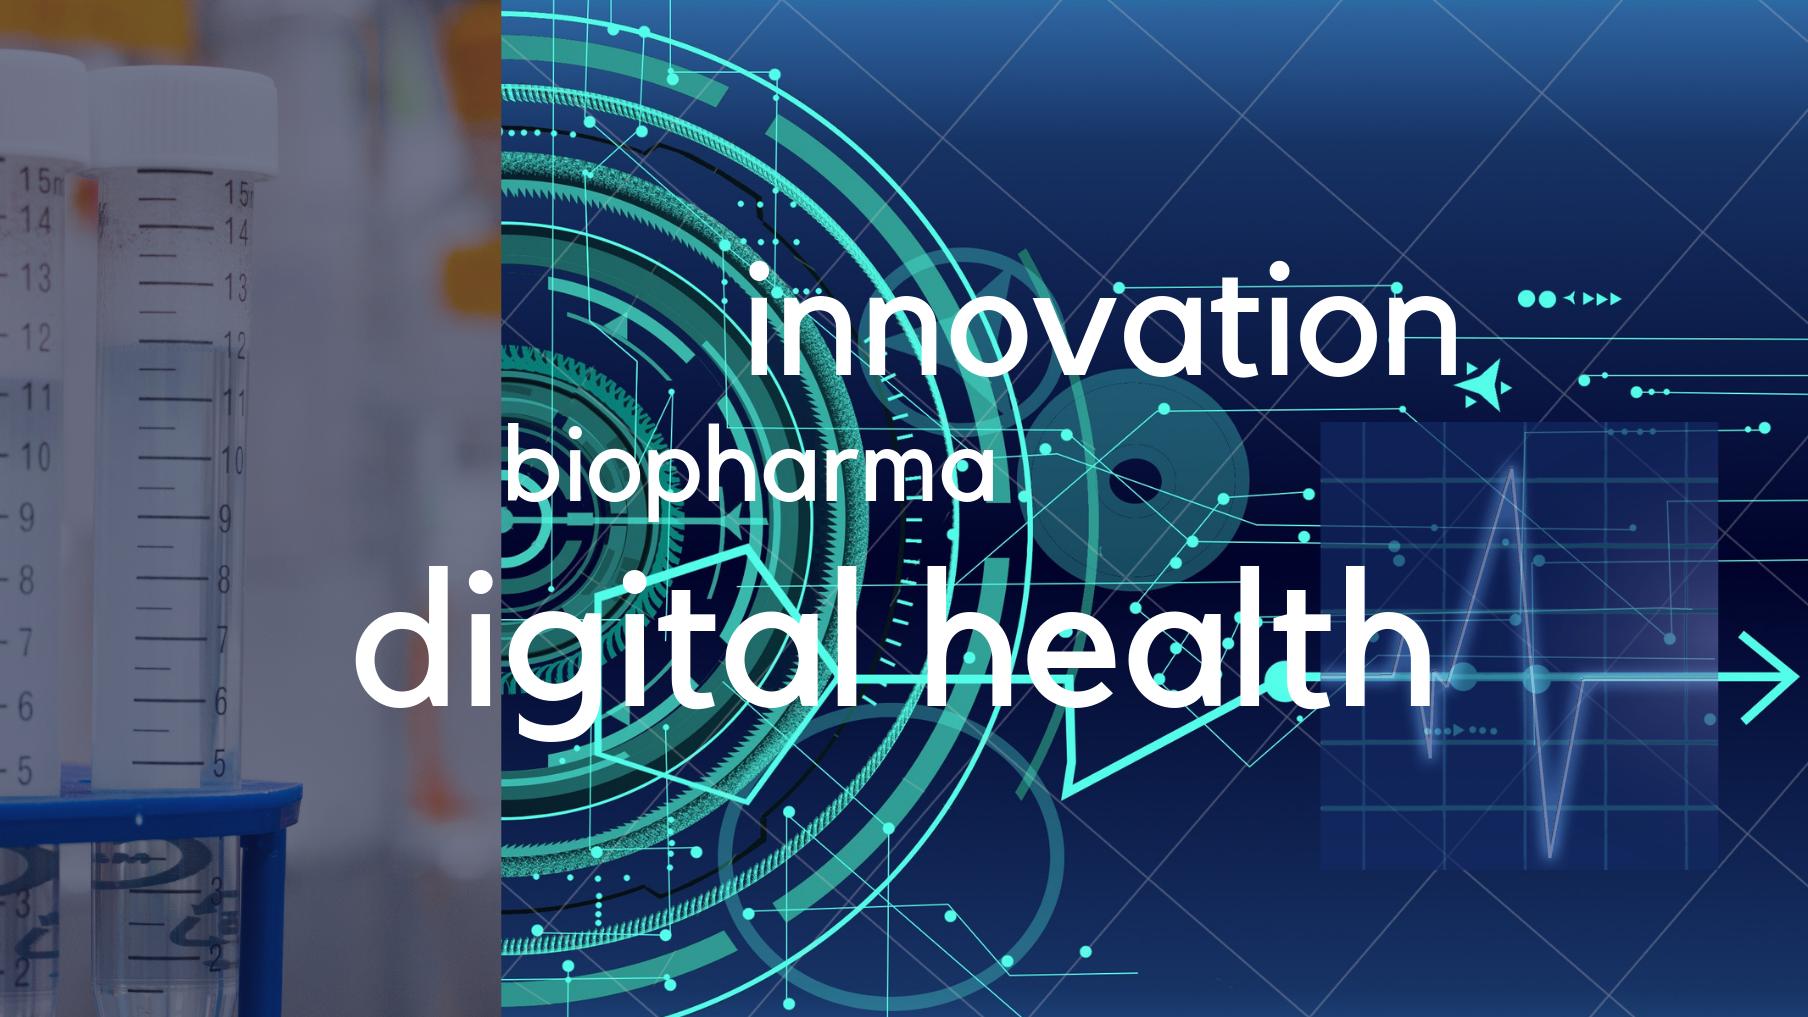 Innovation in BioPharma & Digital Health